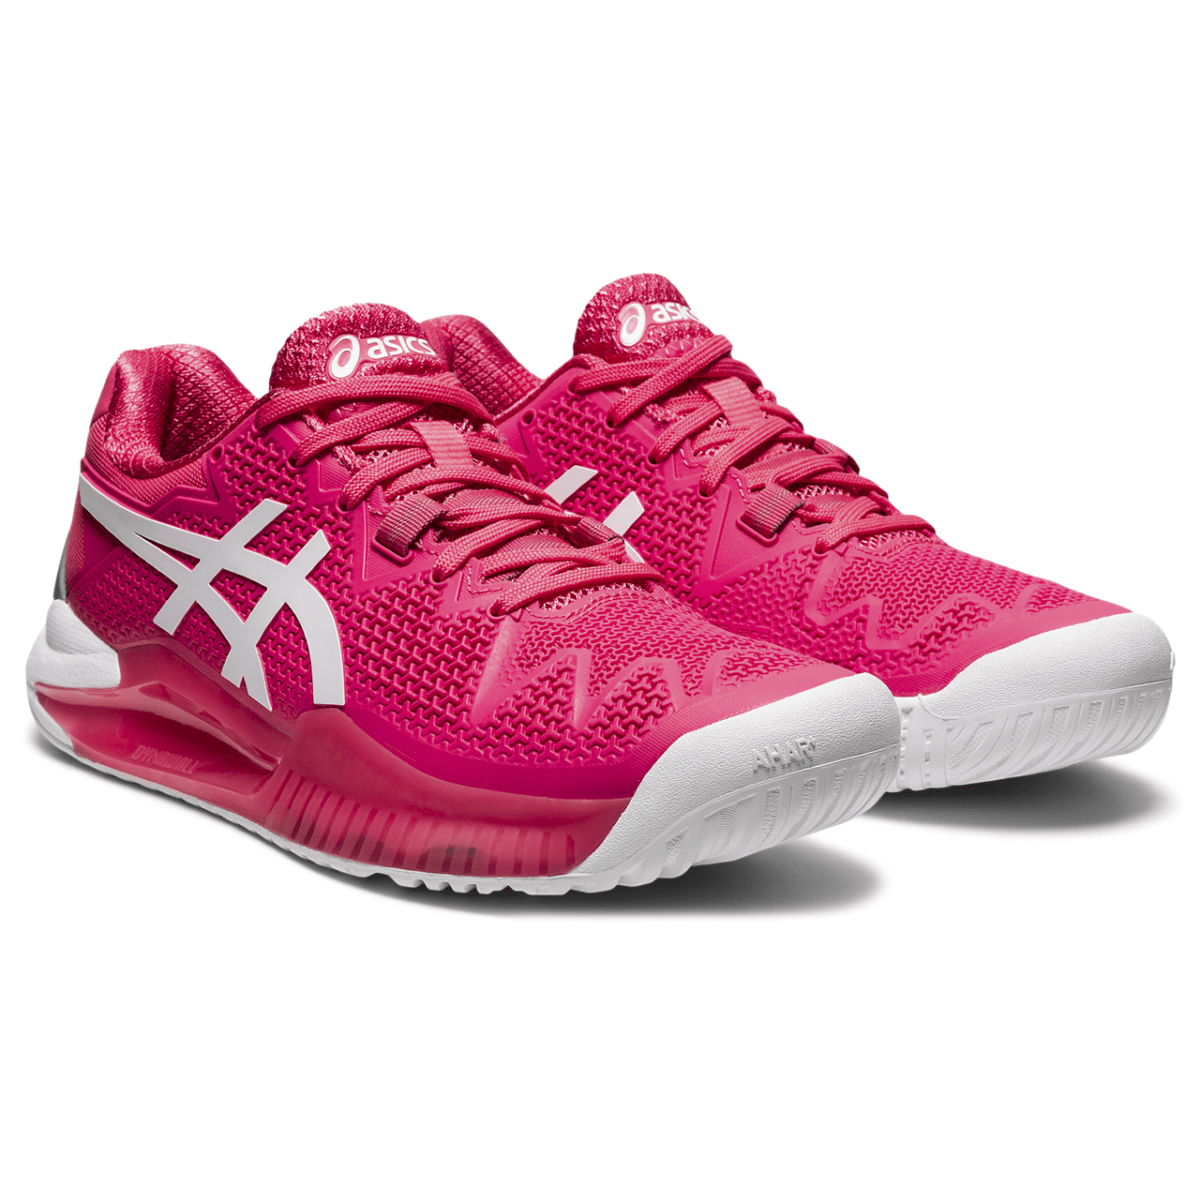 Naiste tennisejalats Asics Gel-Resolution 8 W 2021 (Pink Cameo/White)